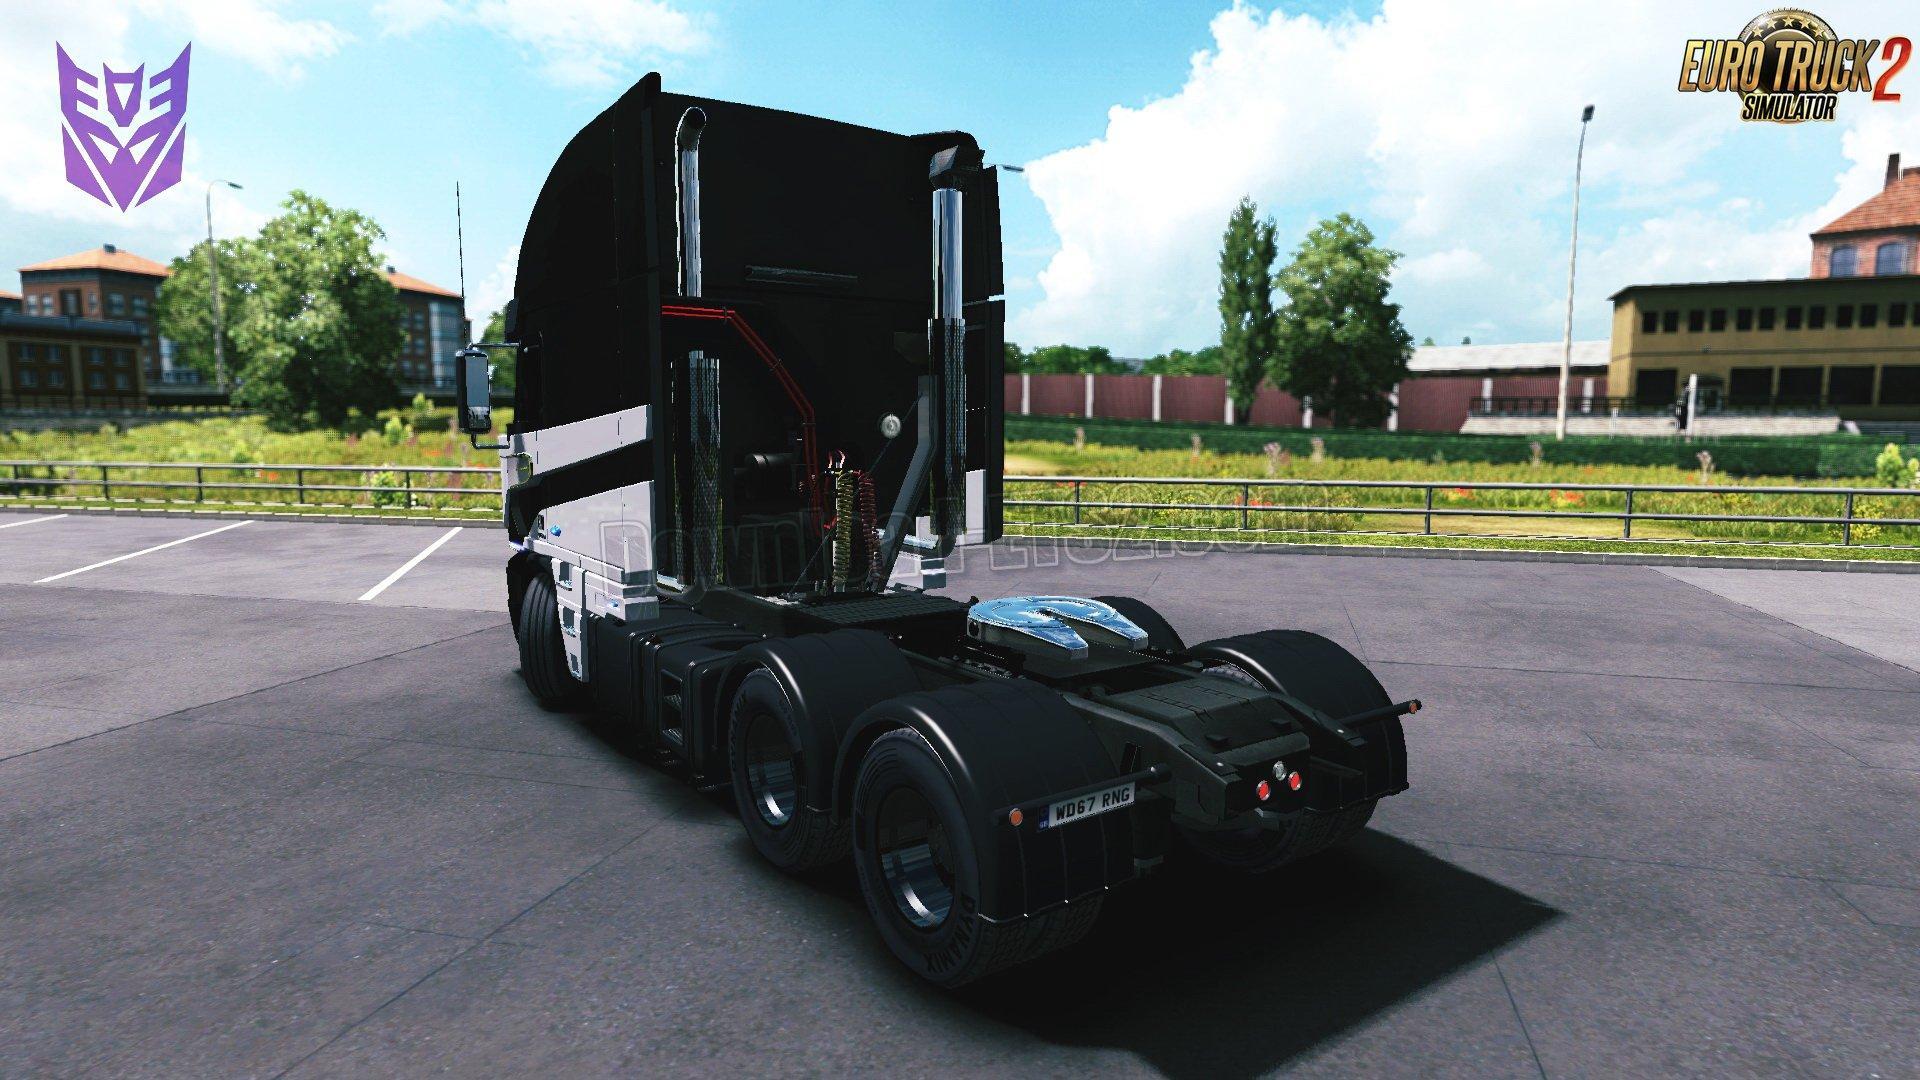 Transformer 4 Galvatron Truck